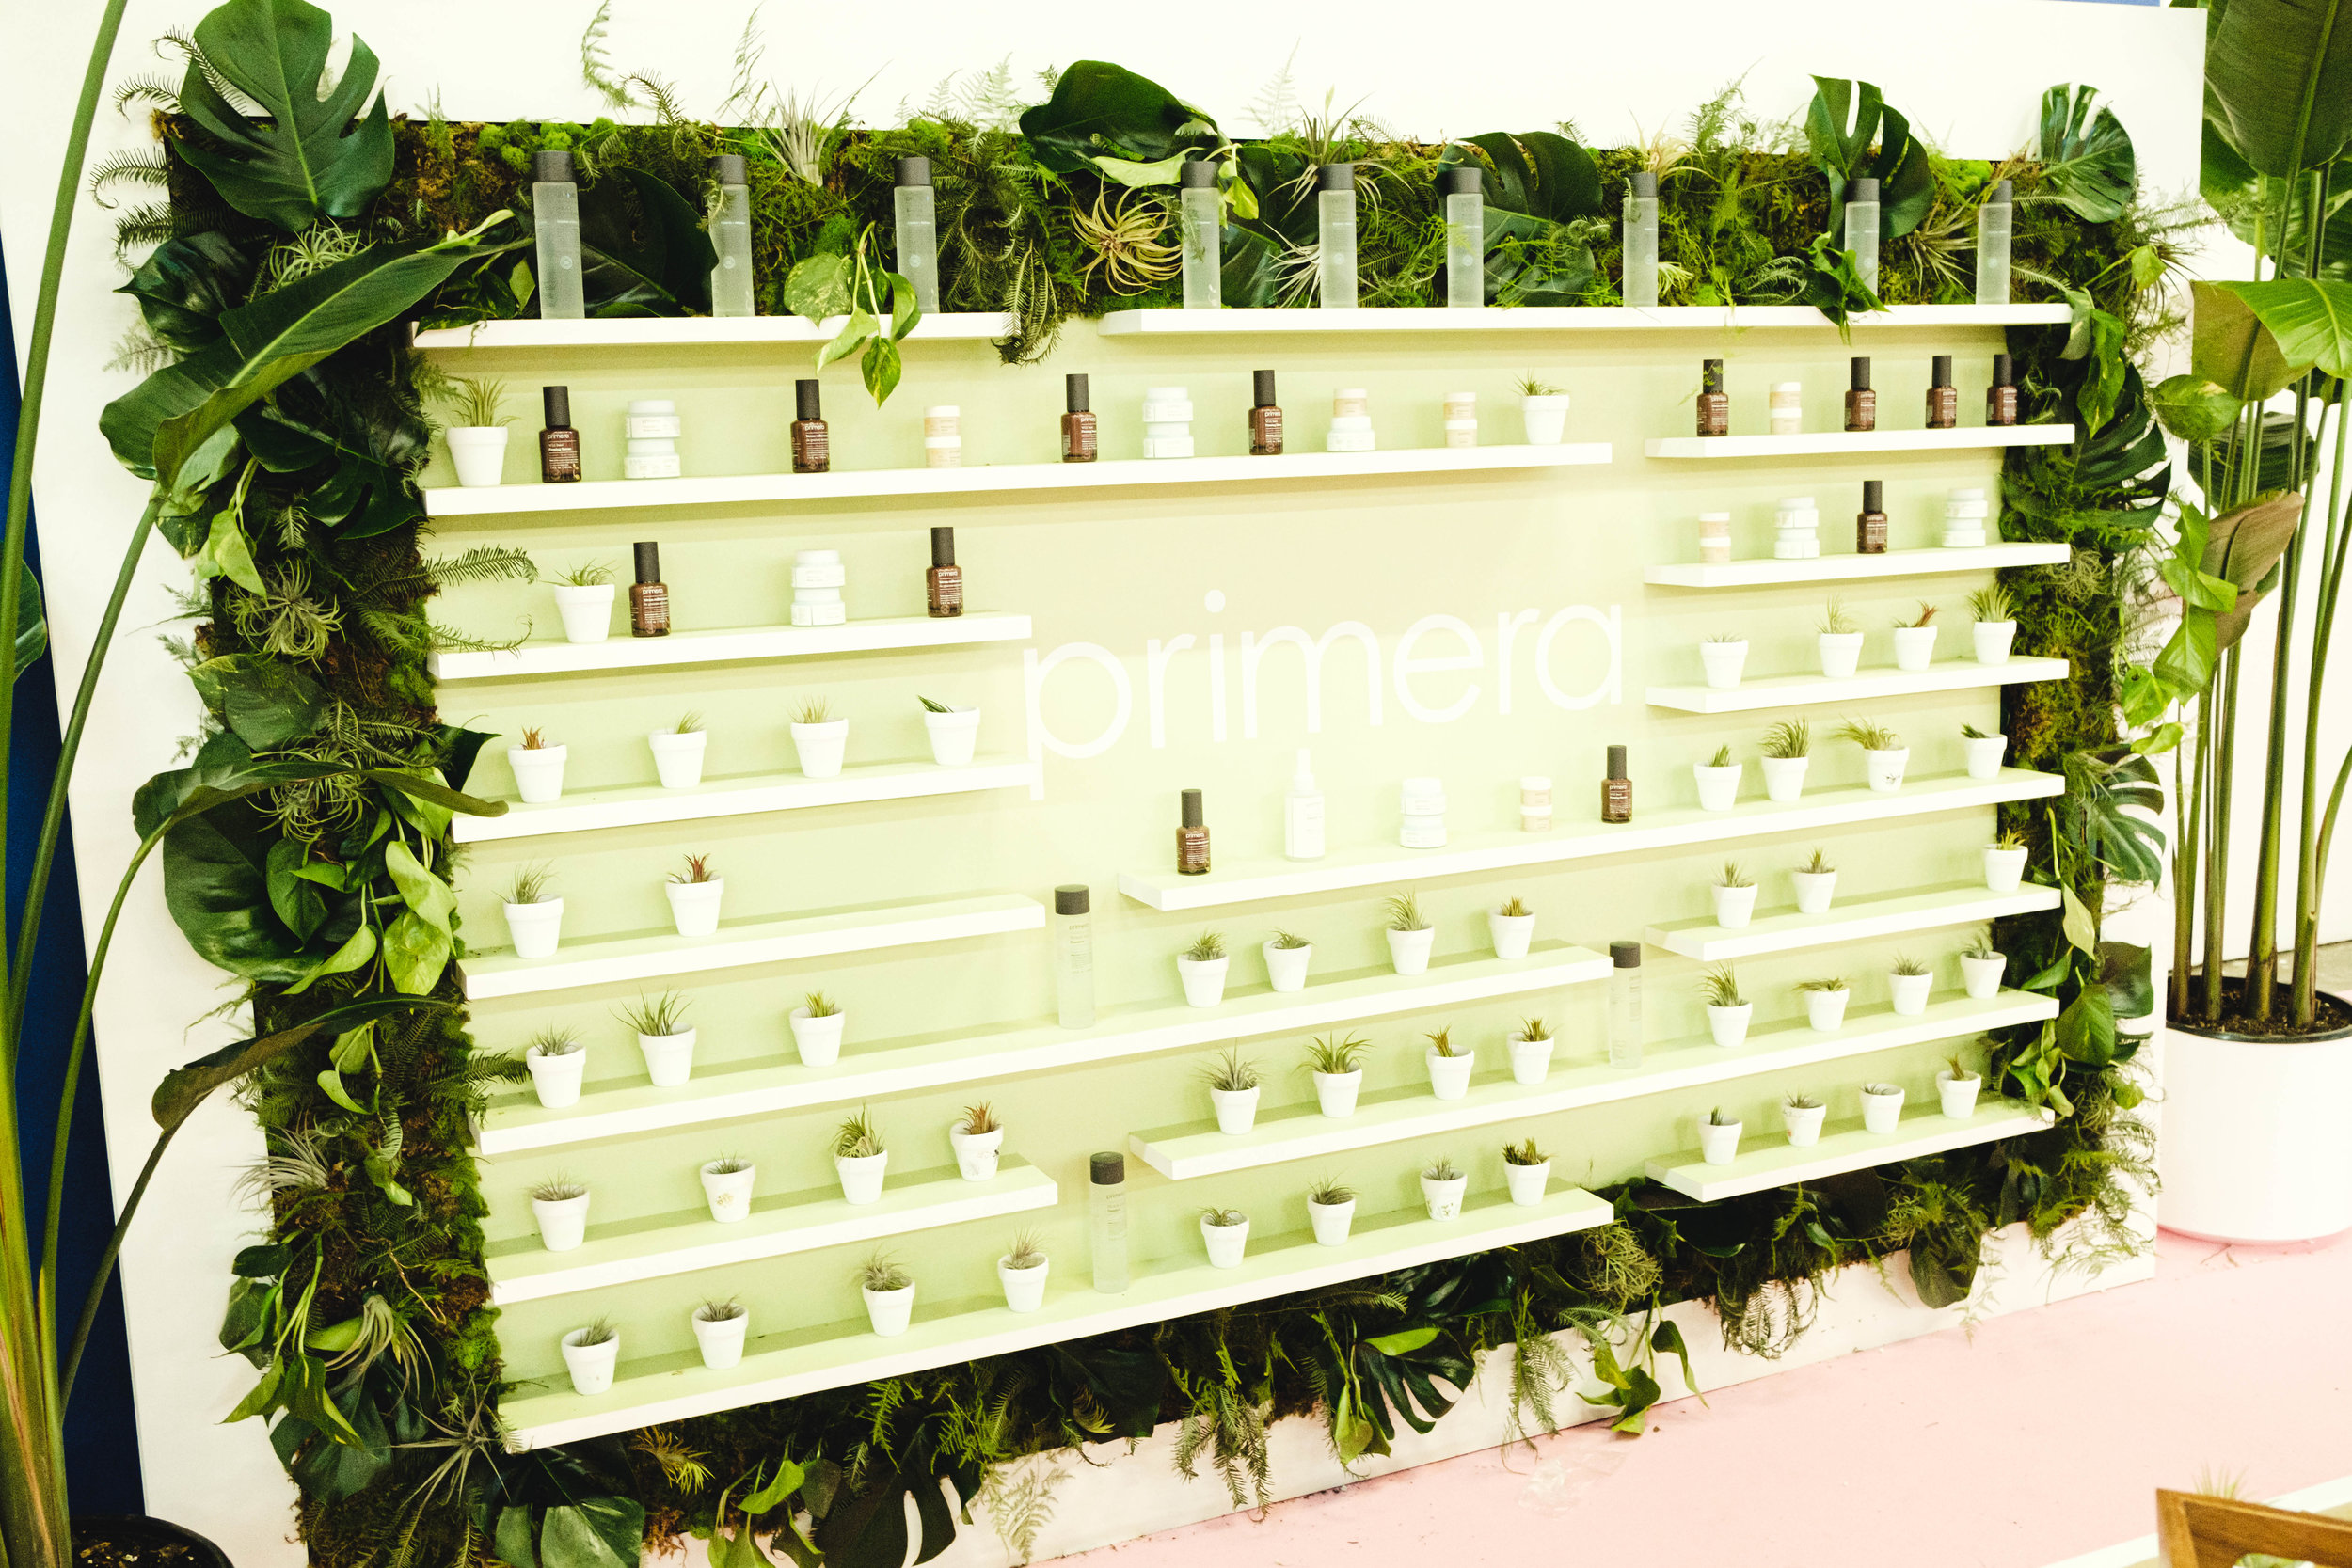 Primera Greenery Shelving Display